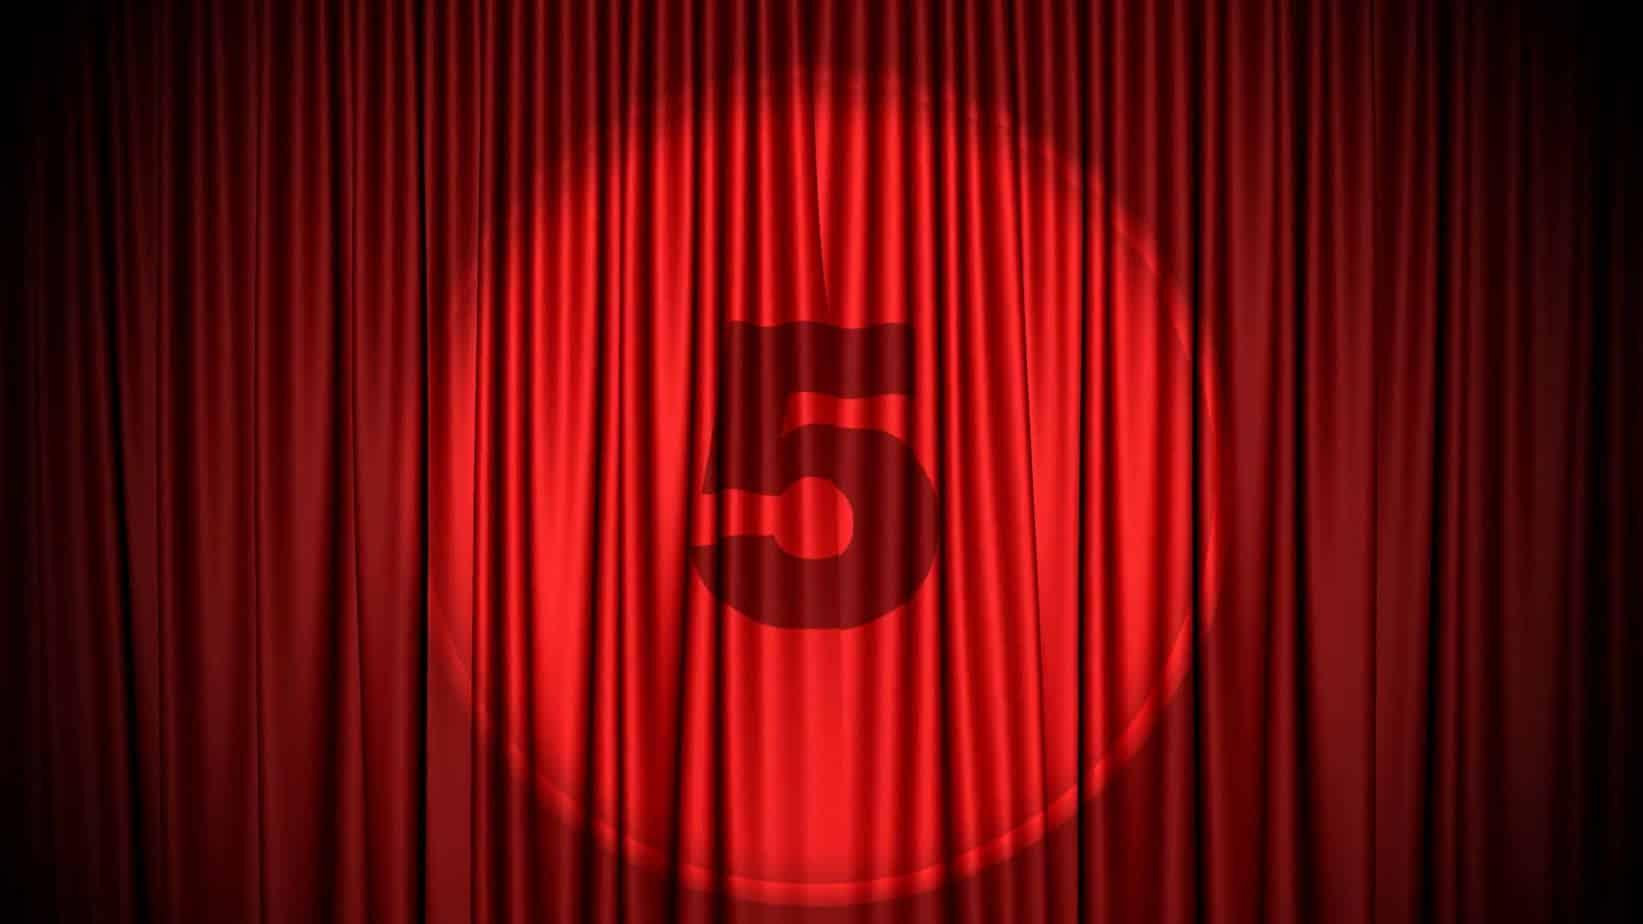 5 sensory deprivation videos